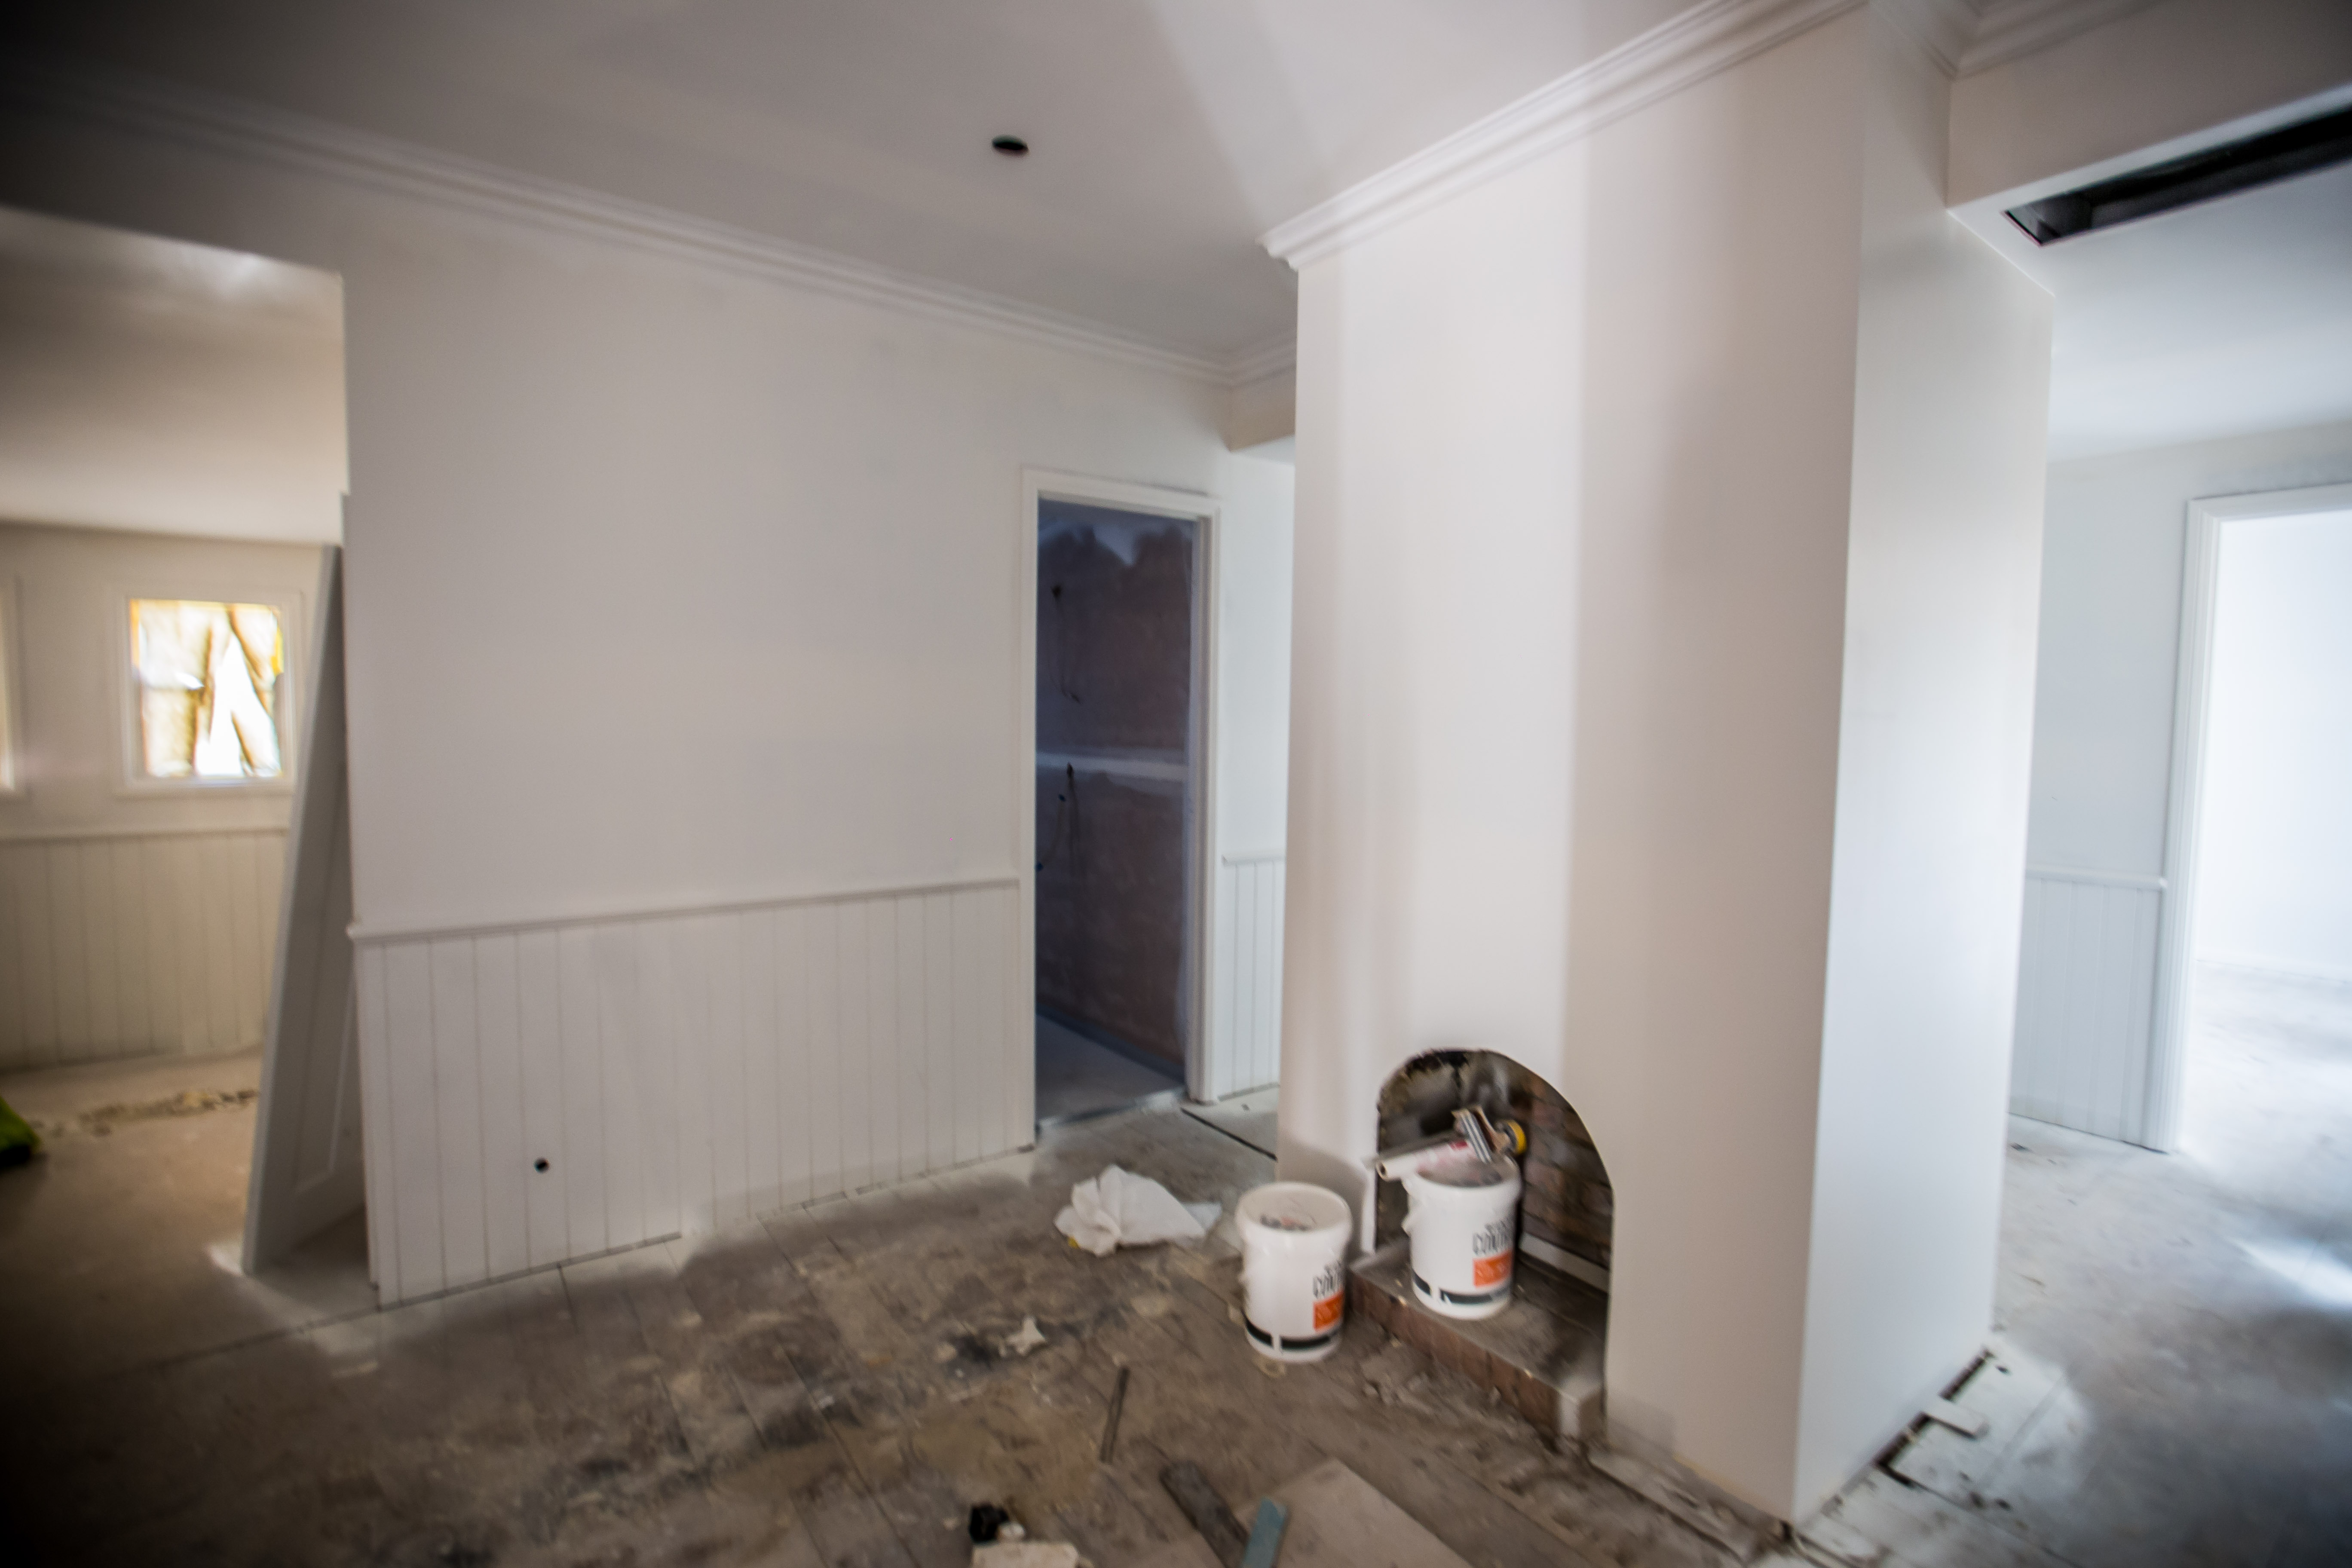 Construction Update - 1st June